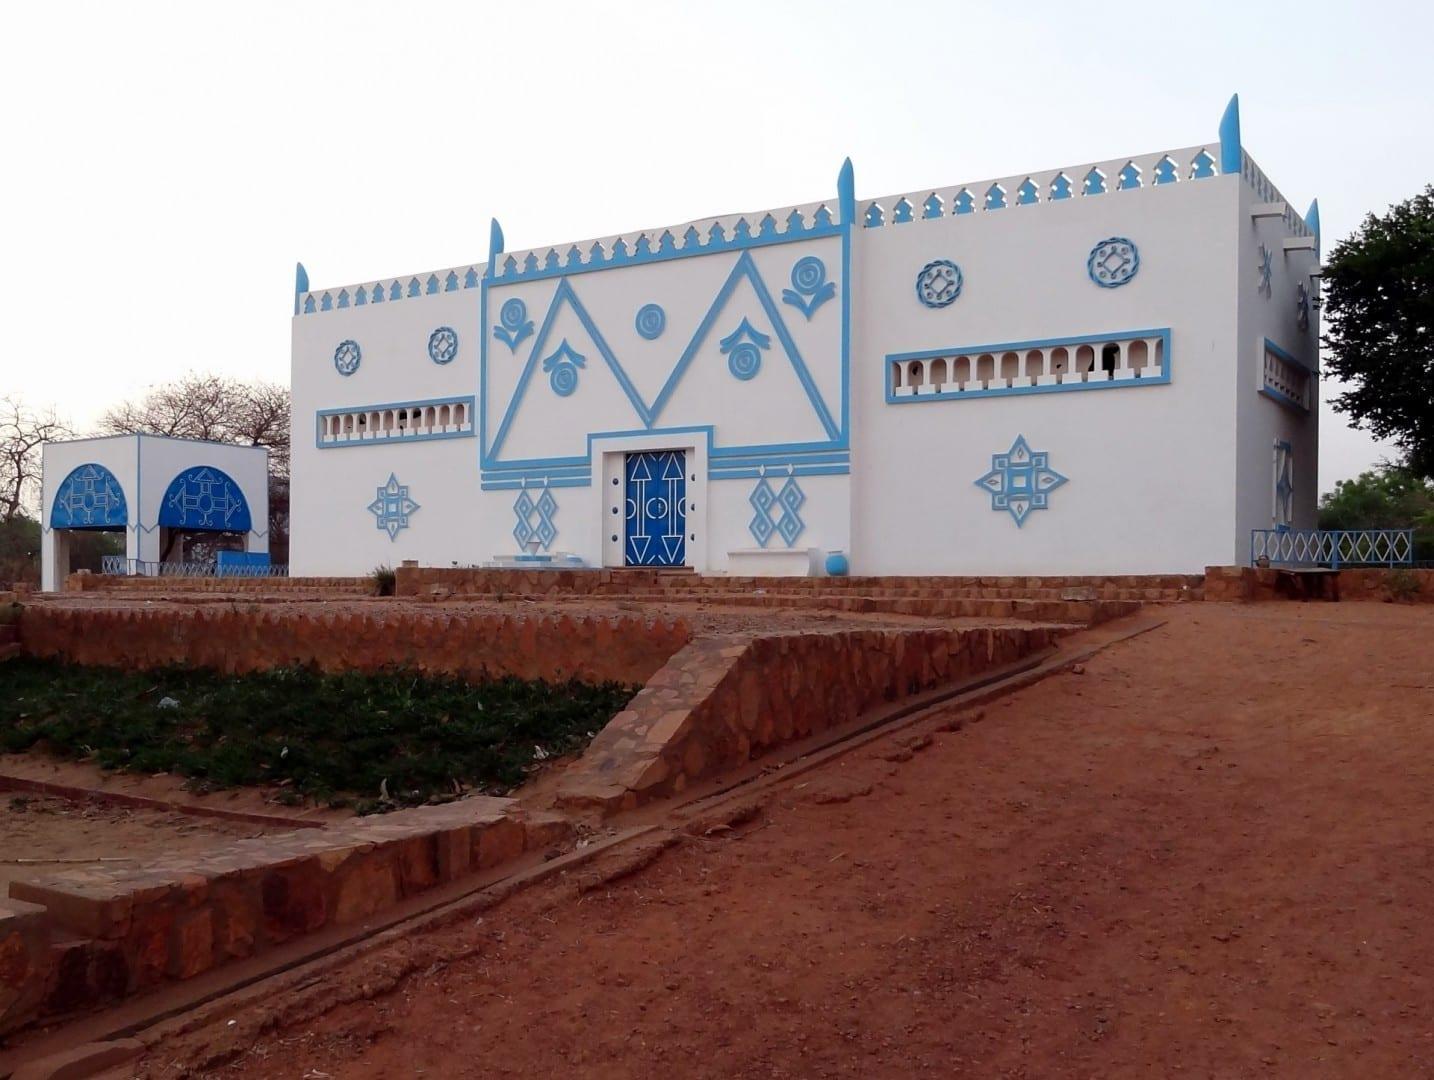 Museo Nacional de Boubou-Hama Niamey Níger